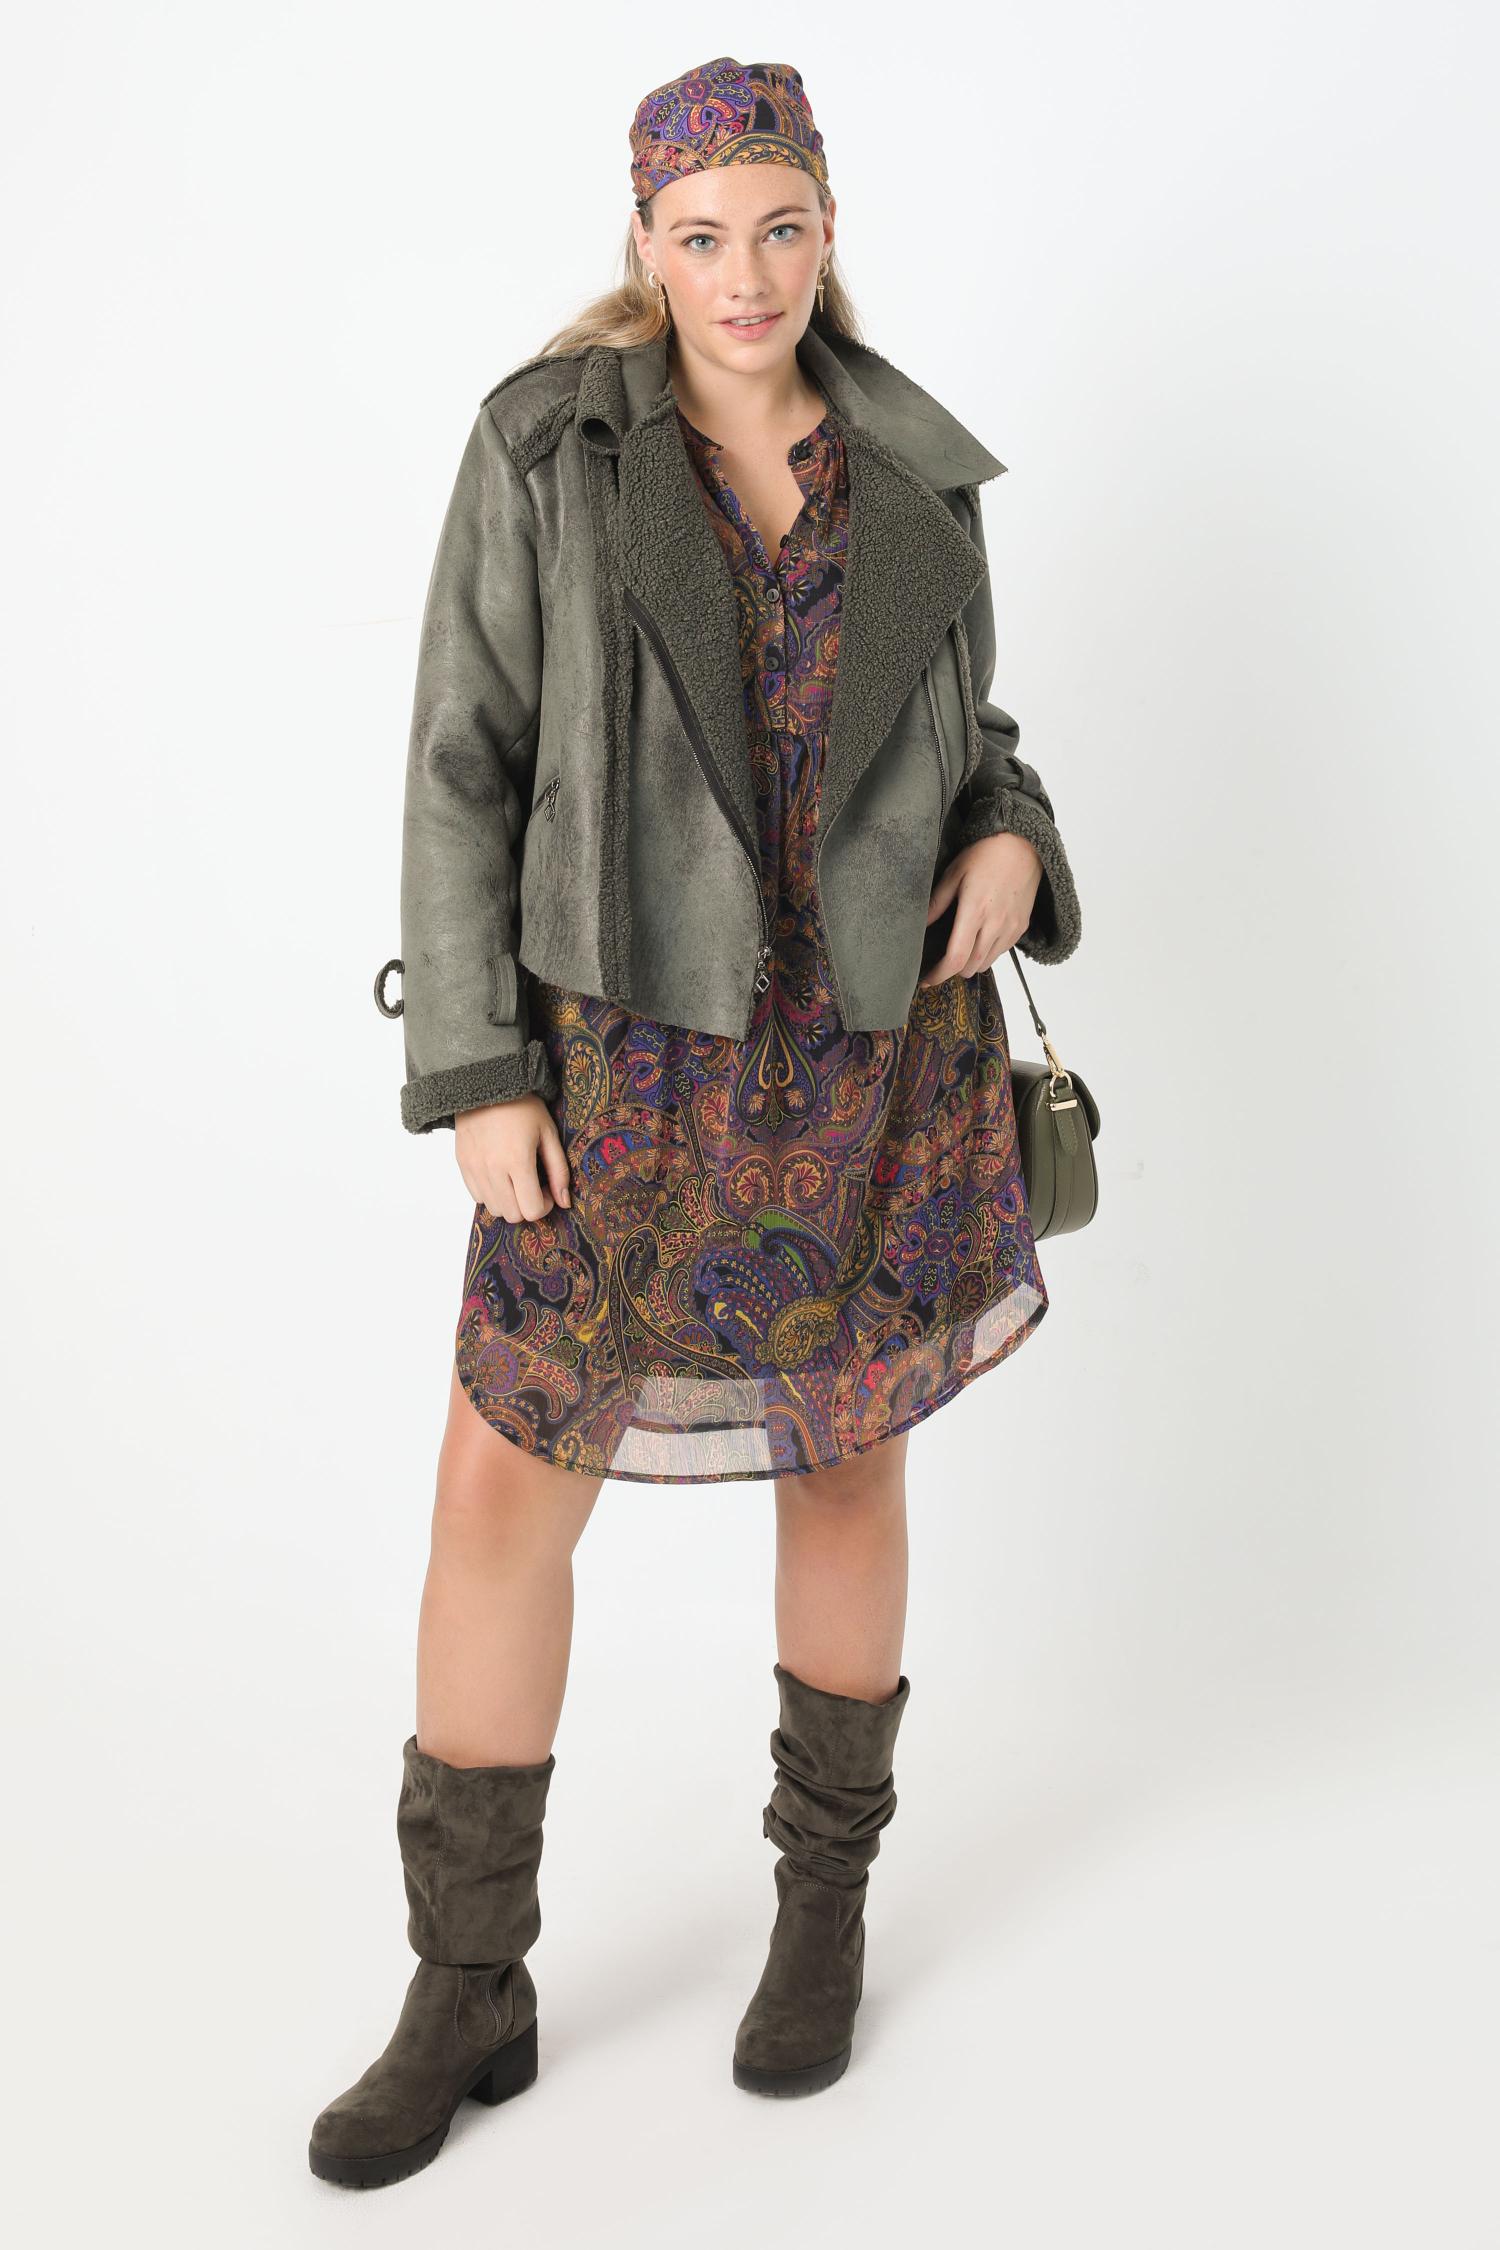 Short vegan suede biker jacket (Shipping October 5/10)